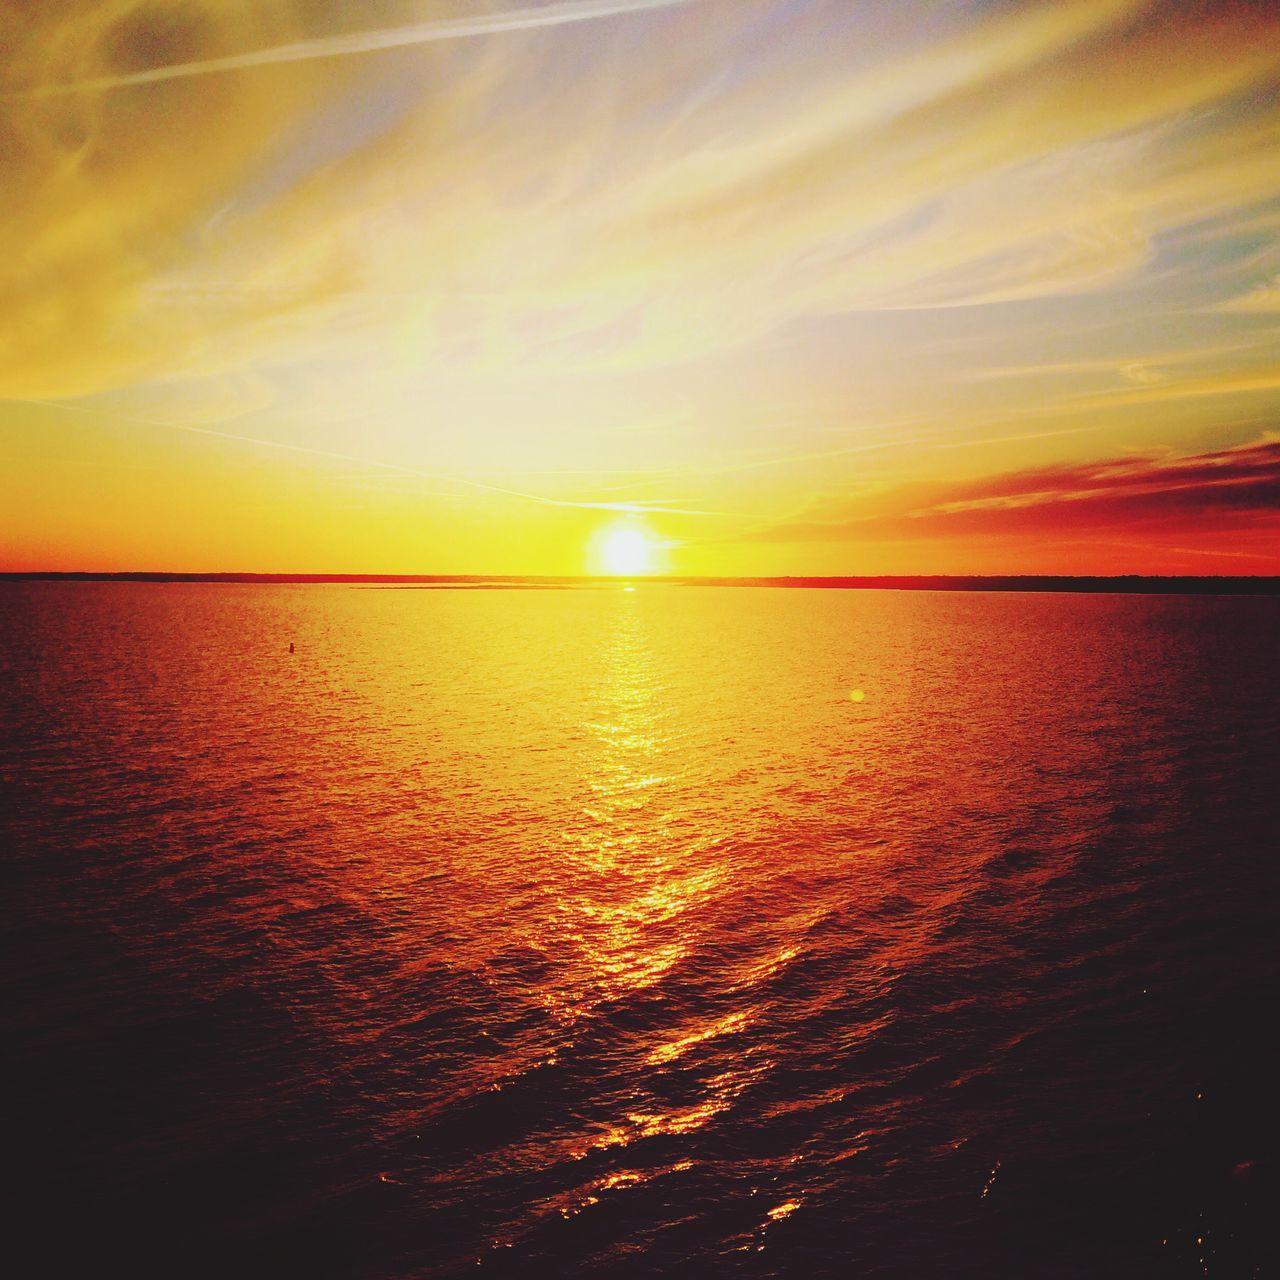 Sunset Sweden Sverige Karlskrona Stenaline Memories